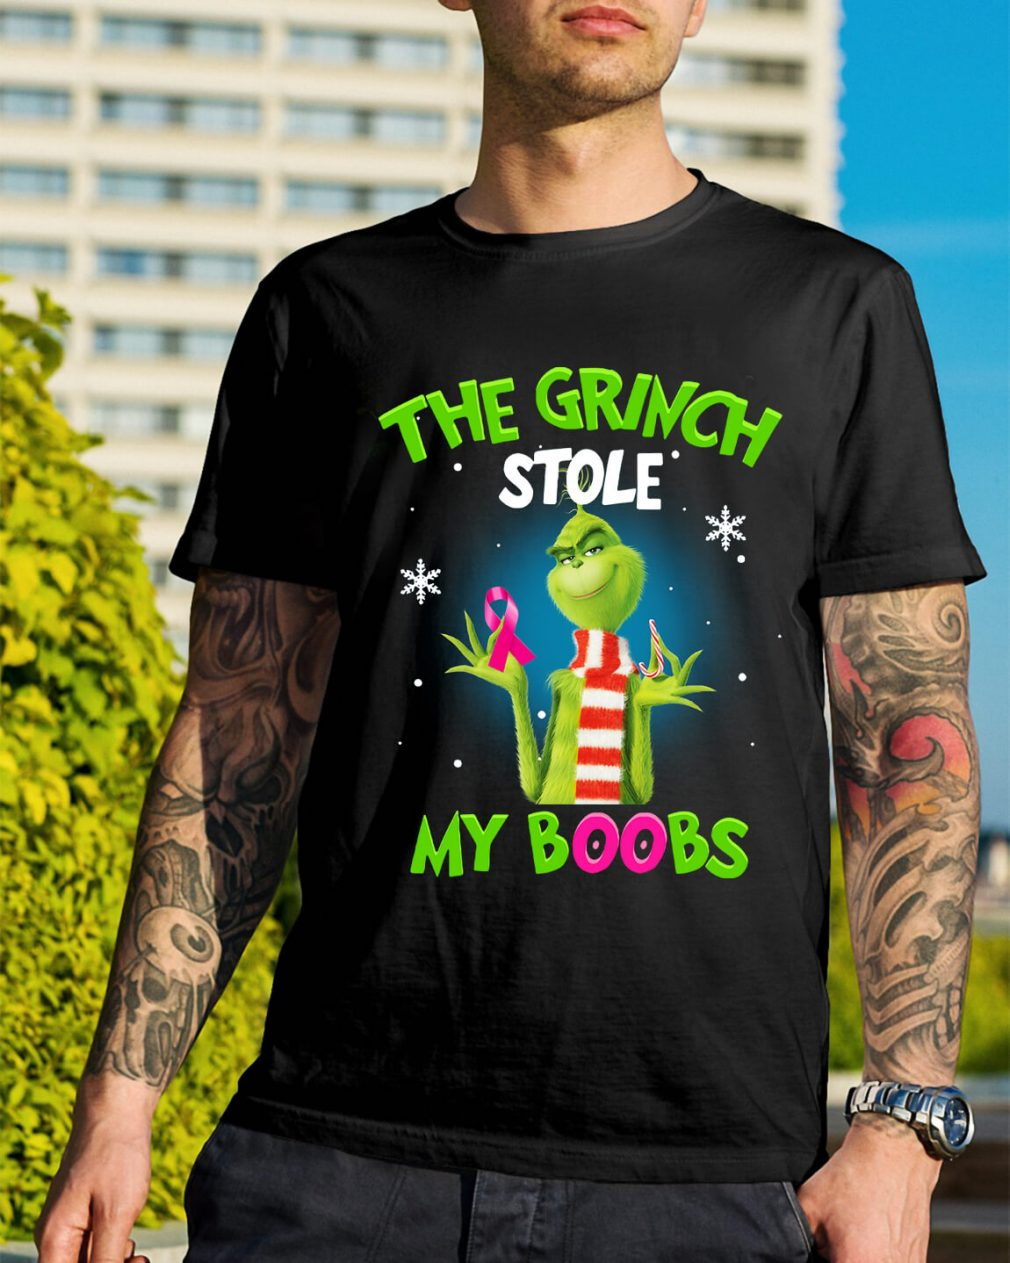 The Grinch stole my boobs Christmas Guys Shirt